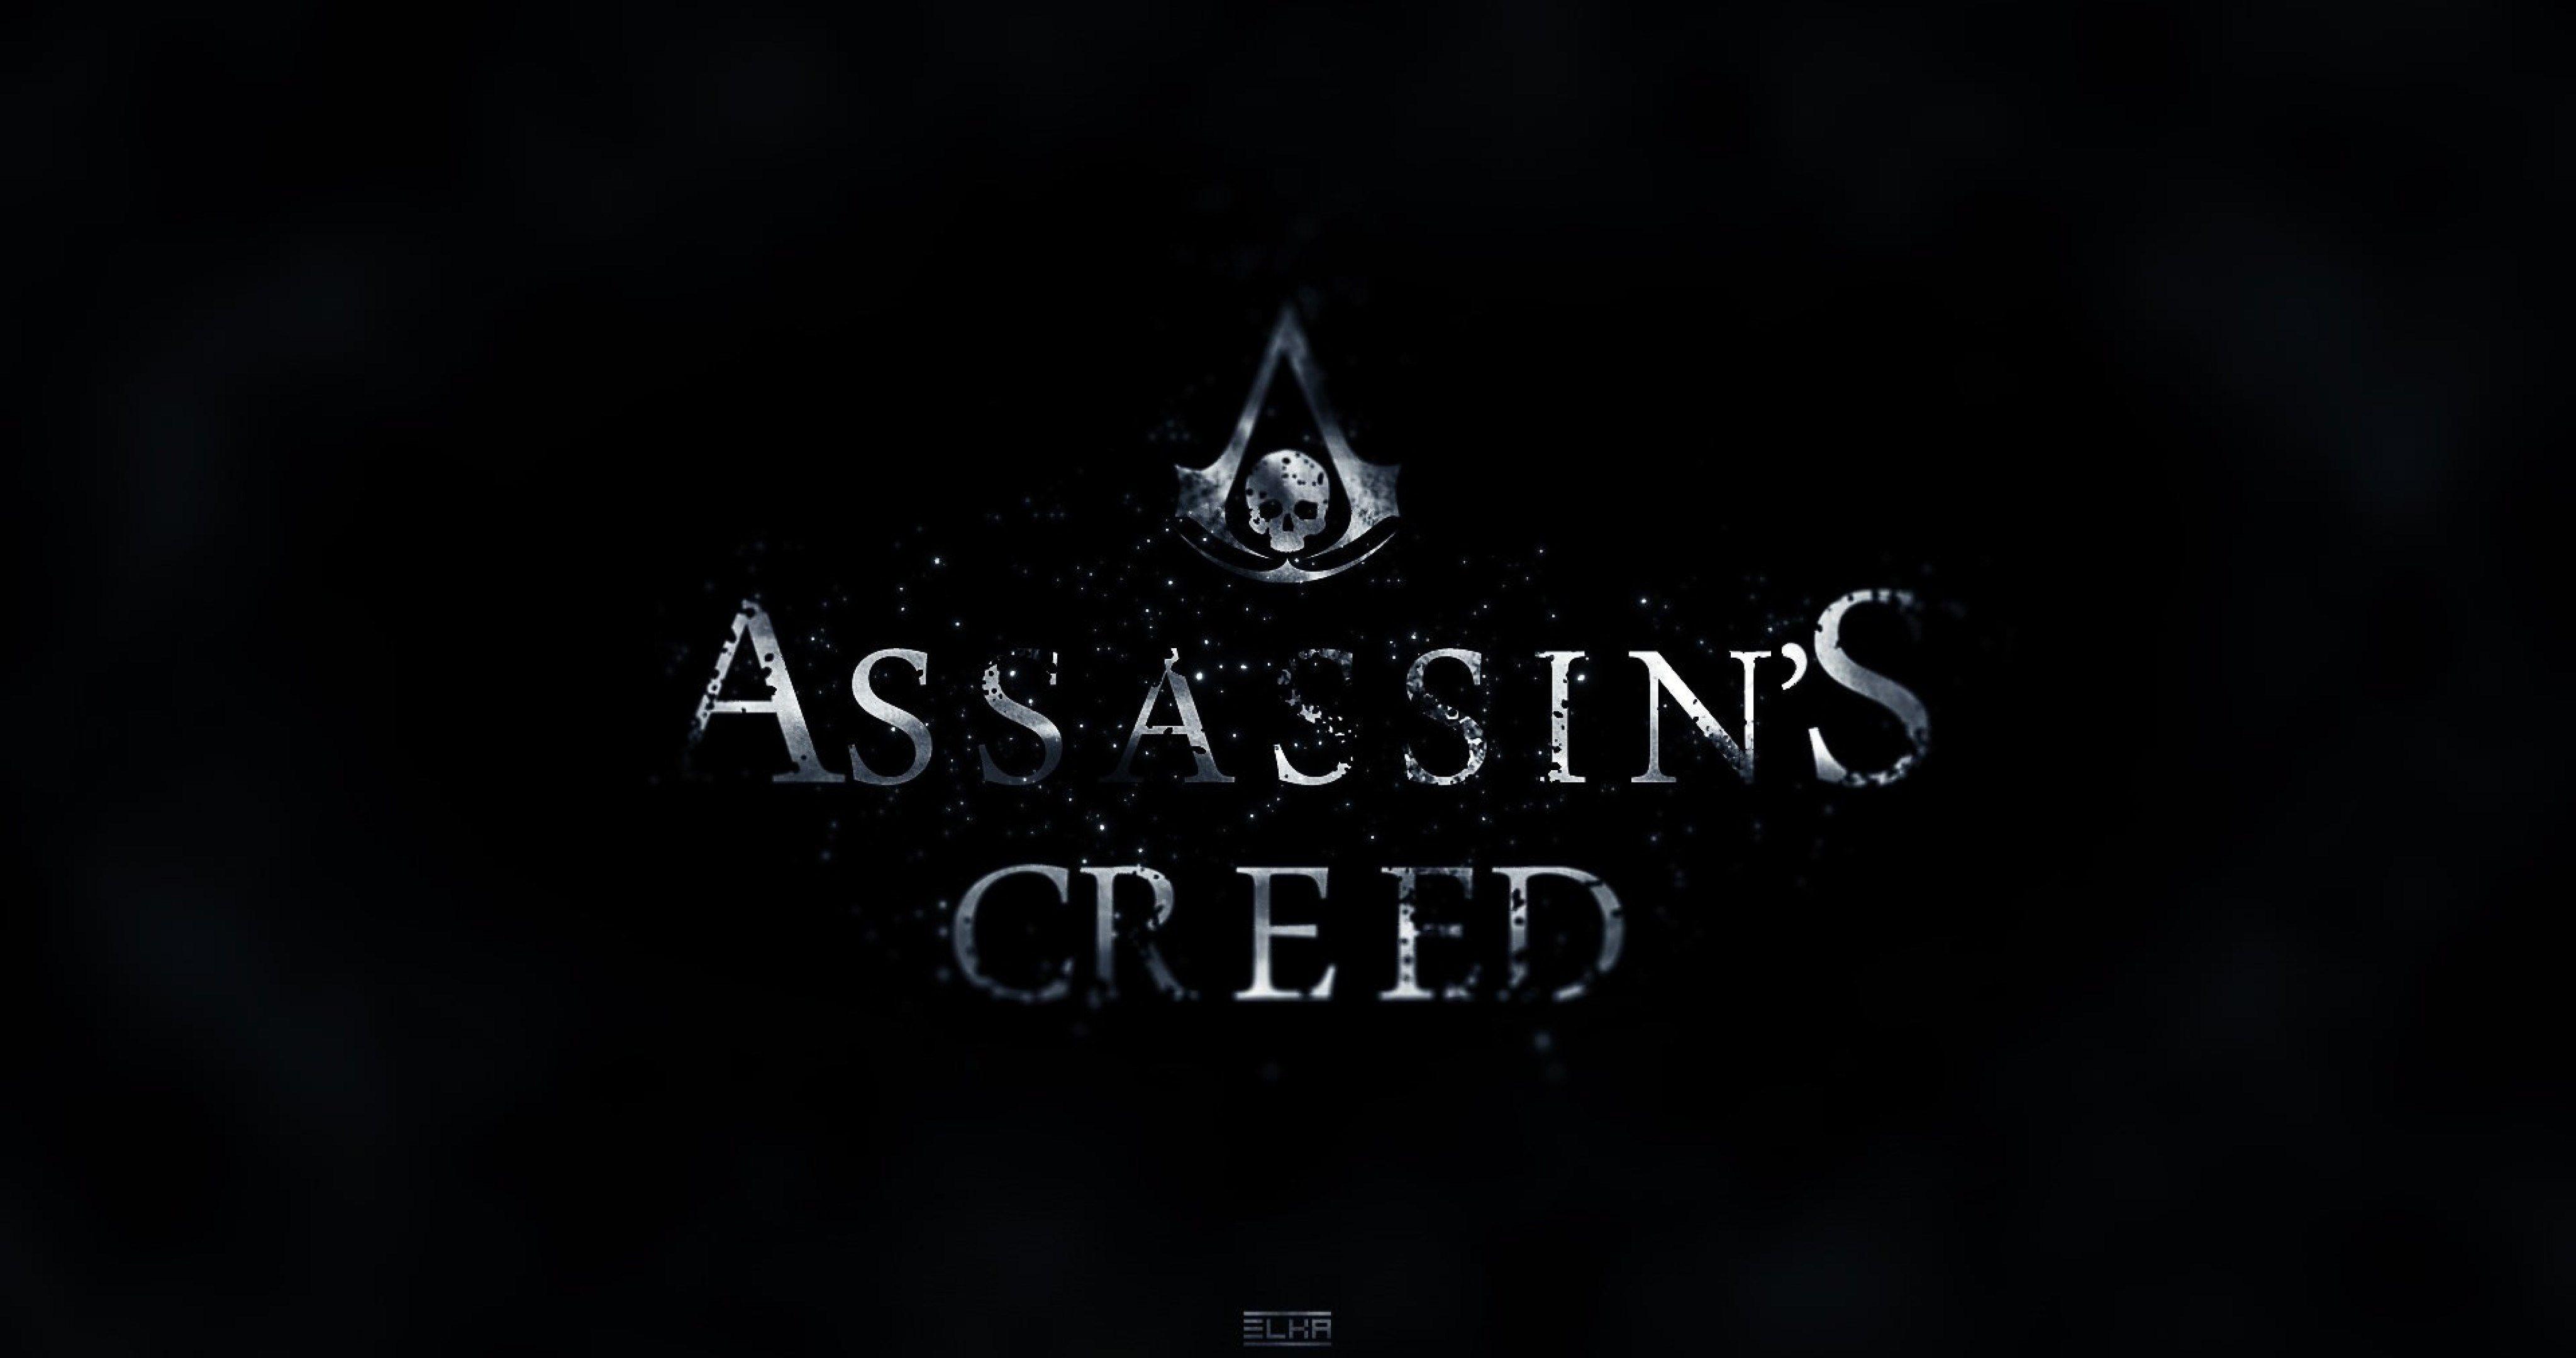 Assassins Creed Iv Black Flag Symbol 4k Ultra Hd Wallpaper Assassins Creed Assassin Creed